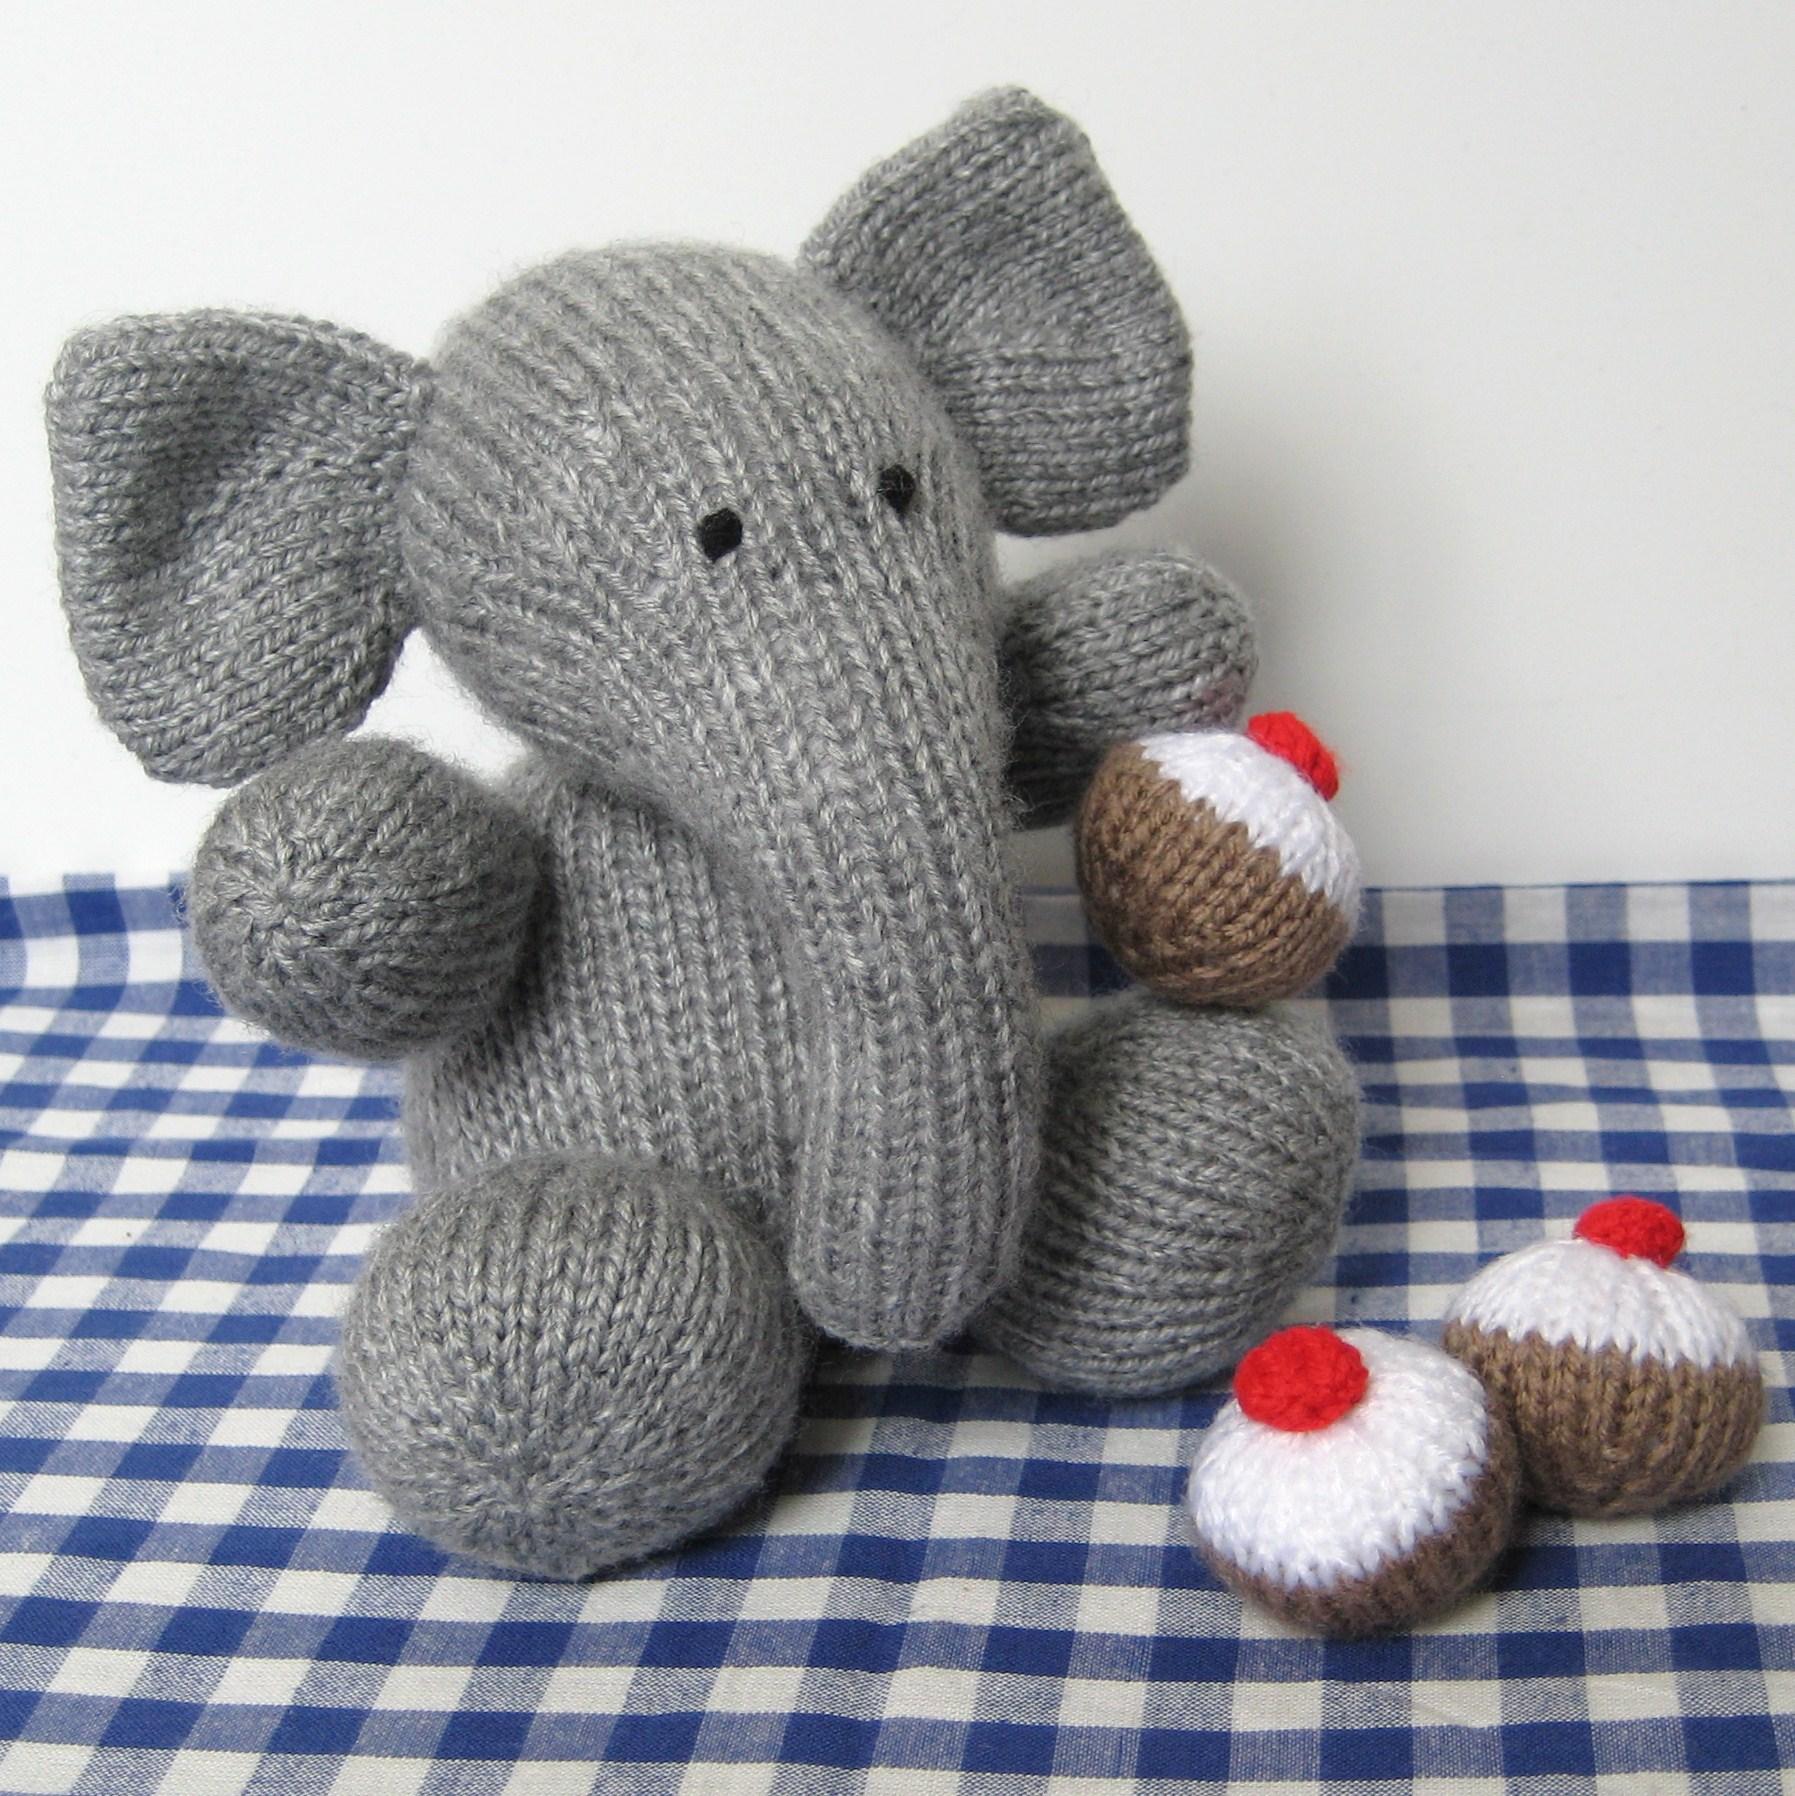 Amigurumi Elephant Knitting Pattern : Bloomsbury elephant knitting pattern